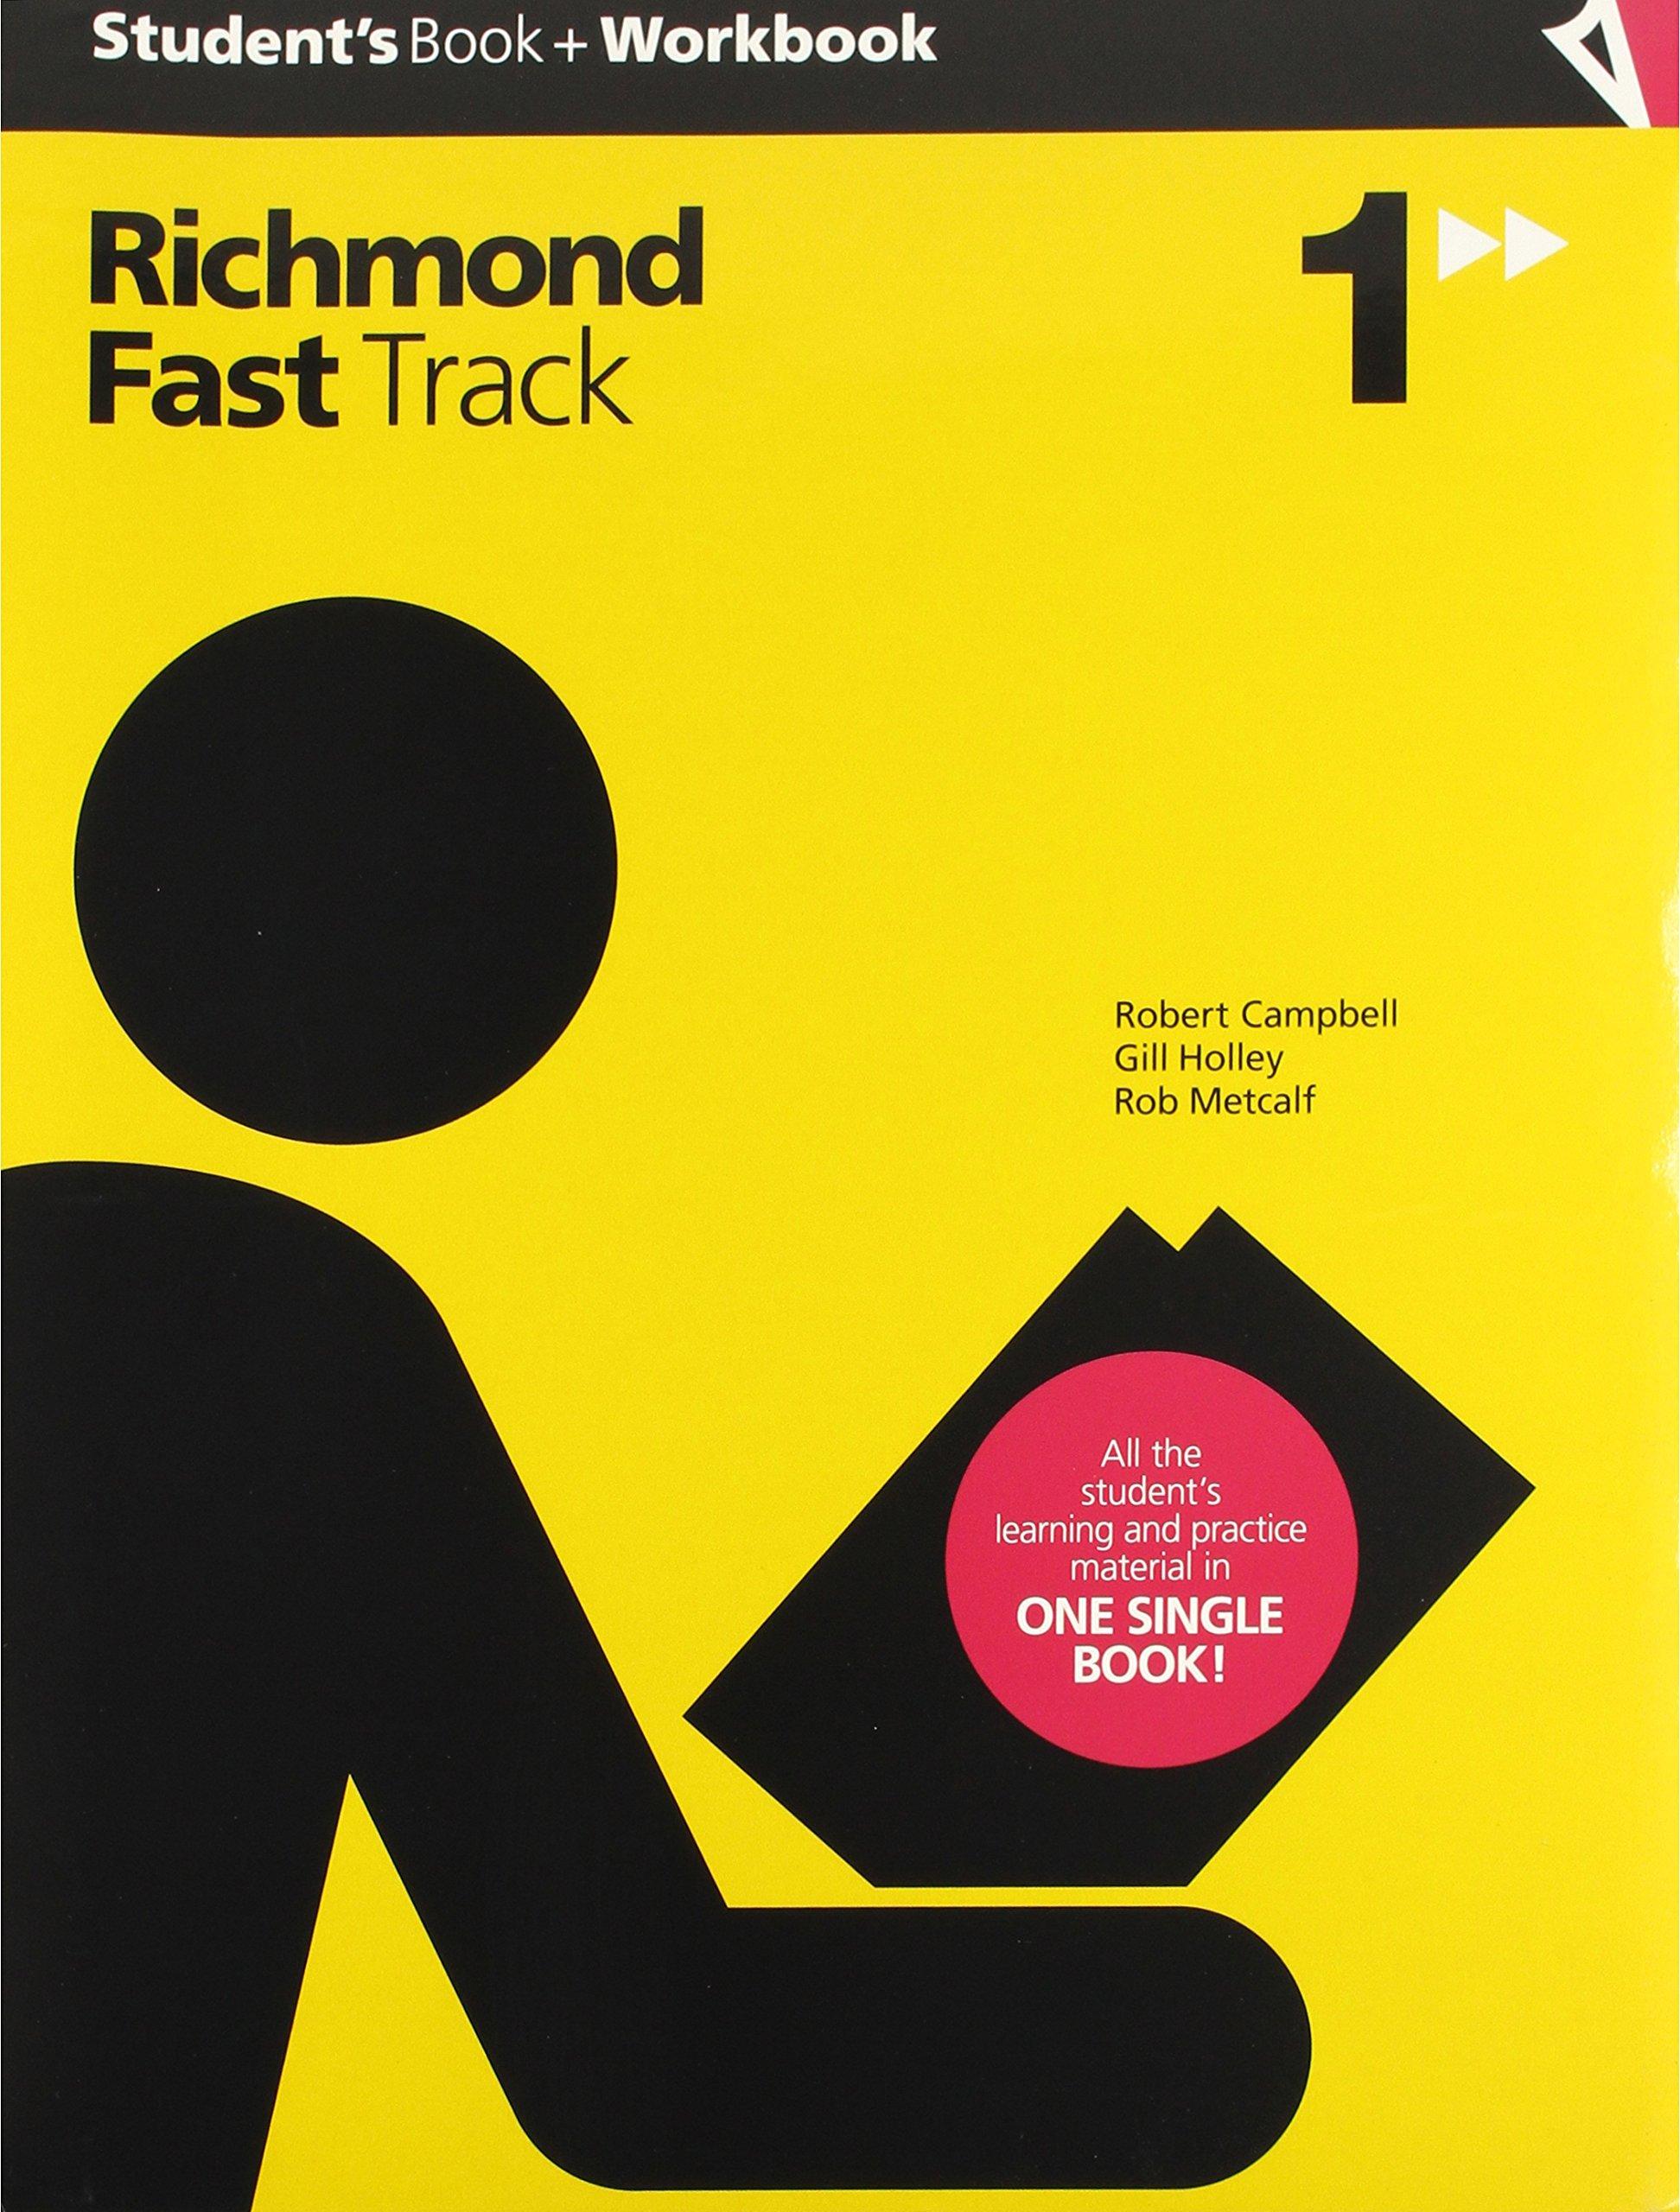 FAST TRACK 1 STUDENTS + WORKBOOK - 9788466820097: Amazon.es: Holley, Gillian Mary, Campbell, Robert Wyndham, Metcalf, Robert Stephen: Libros en idiomas extranjeros